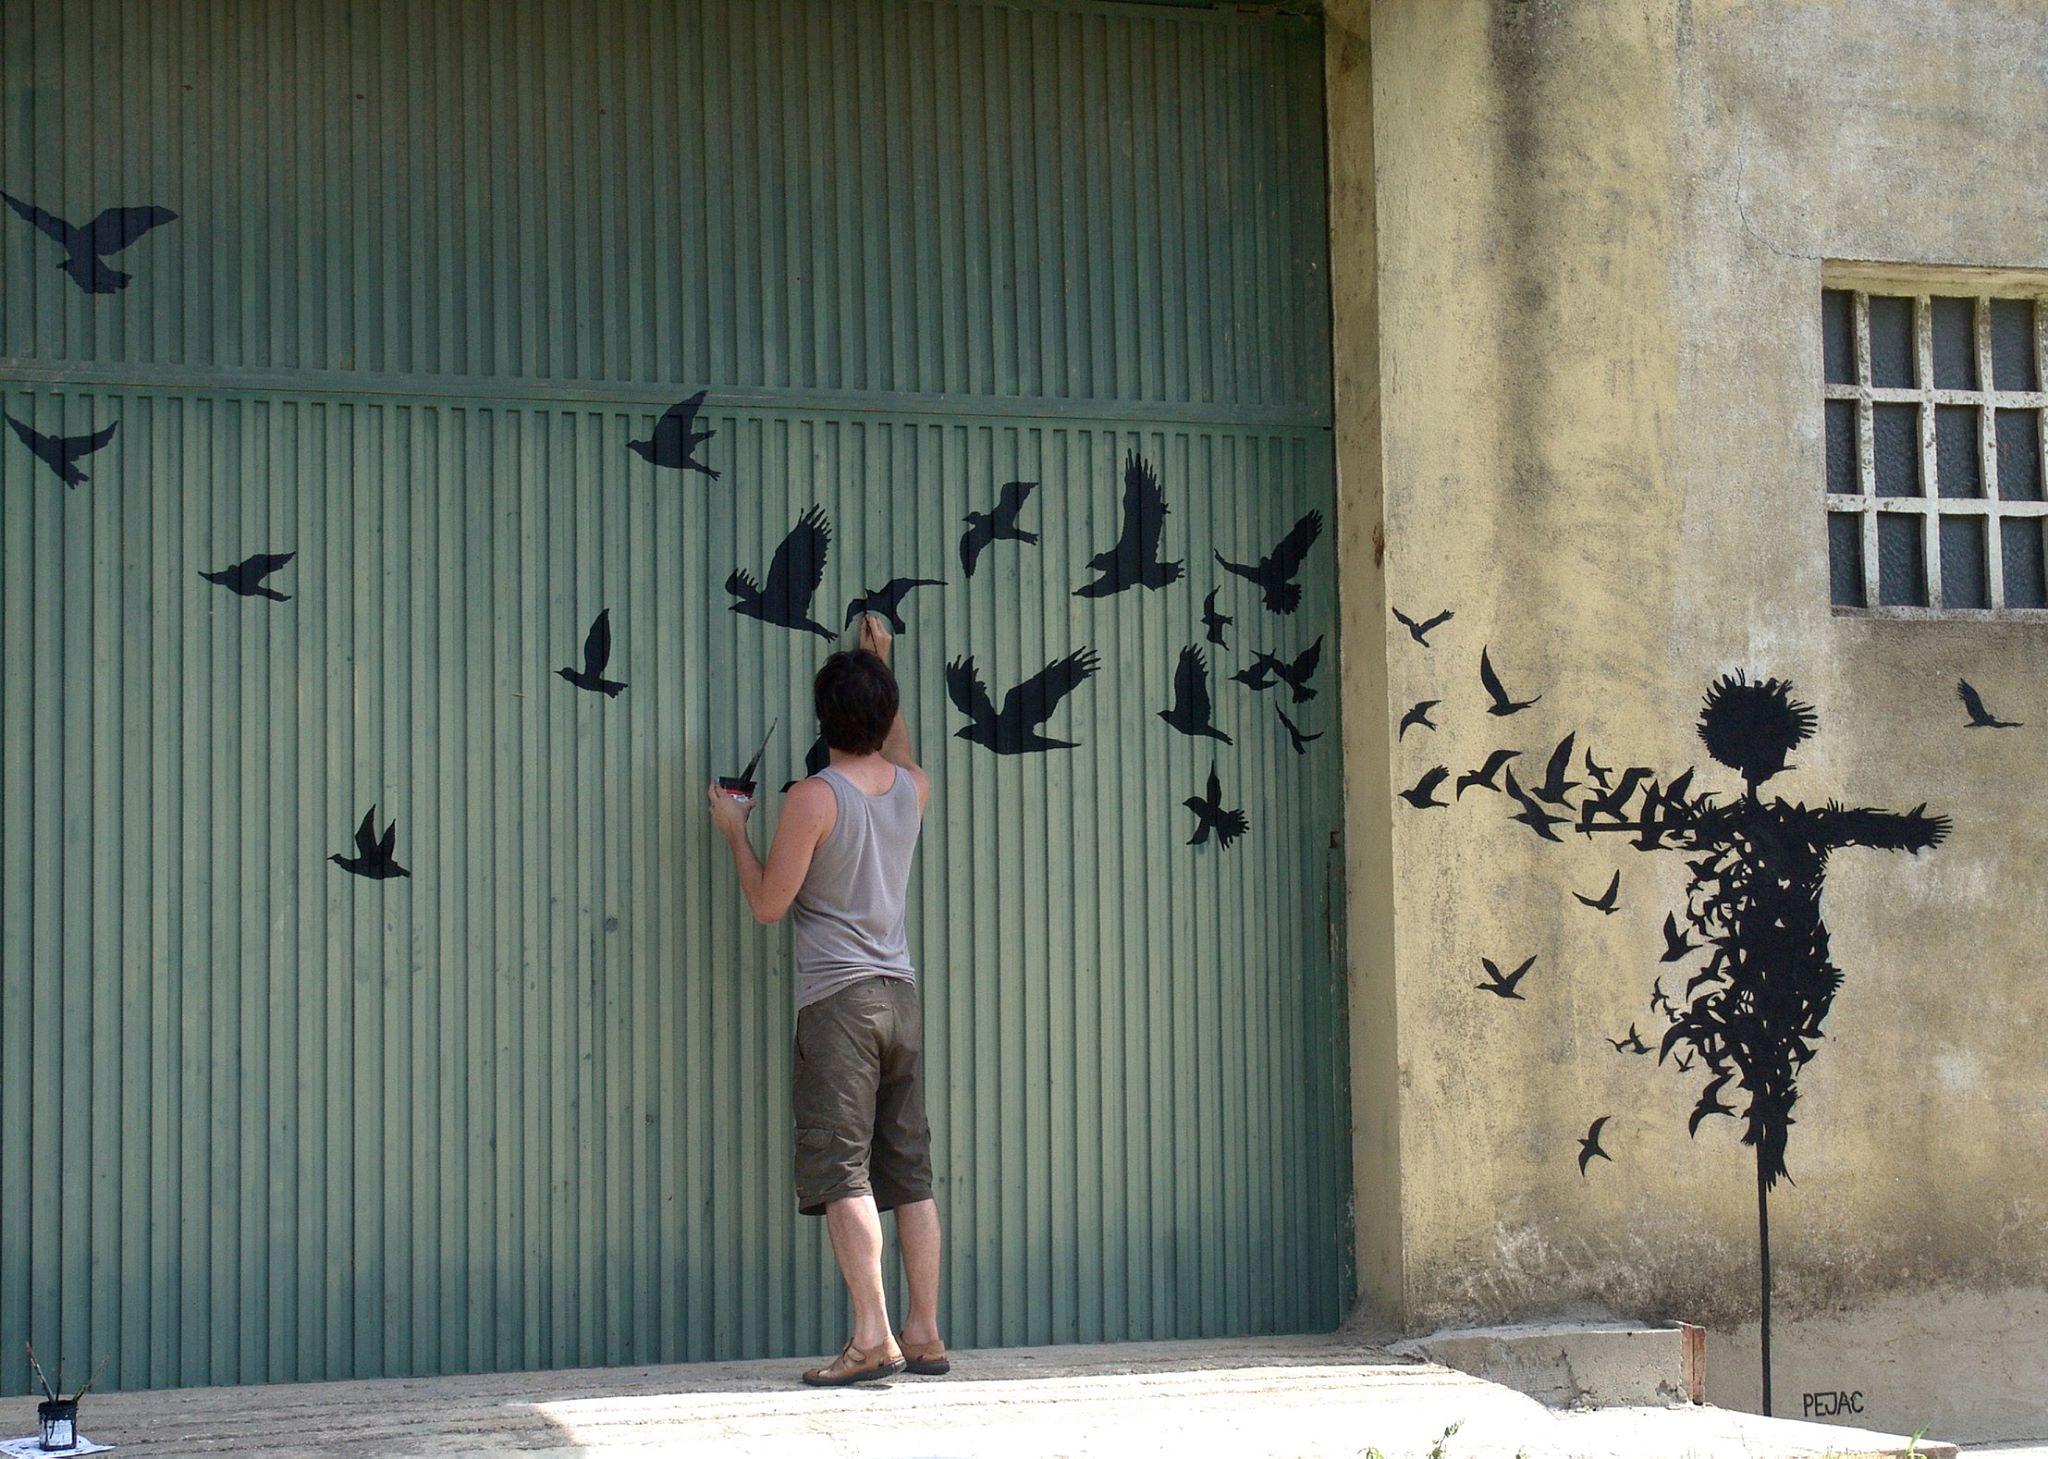 Creative-street-art-pejac-13